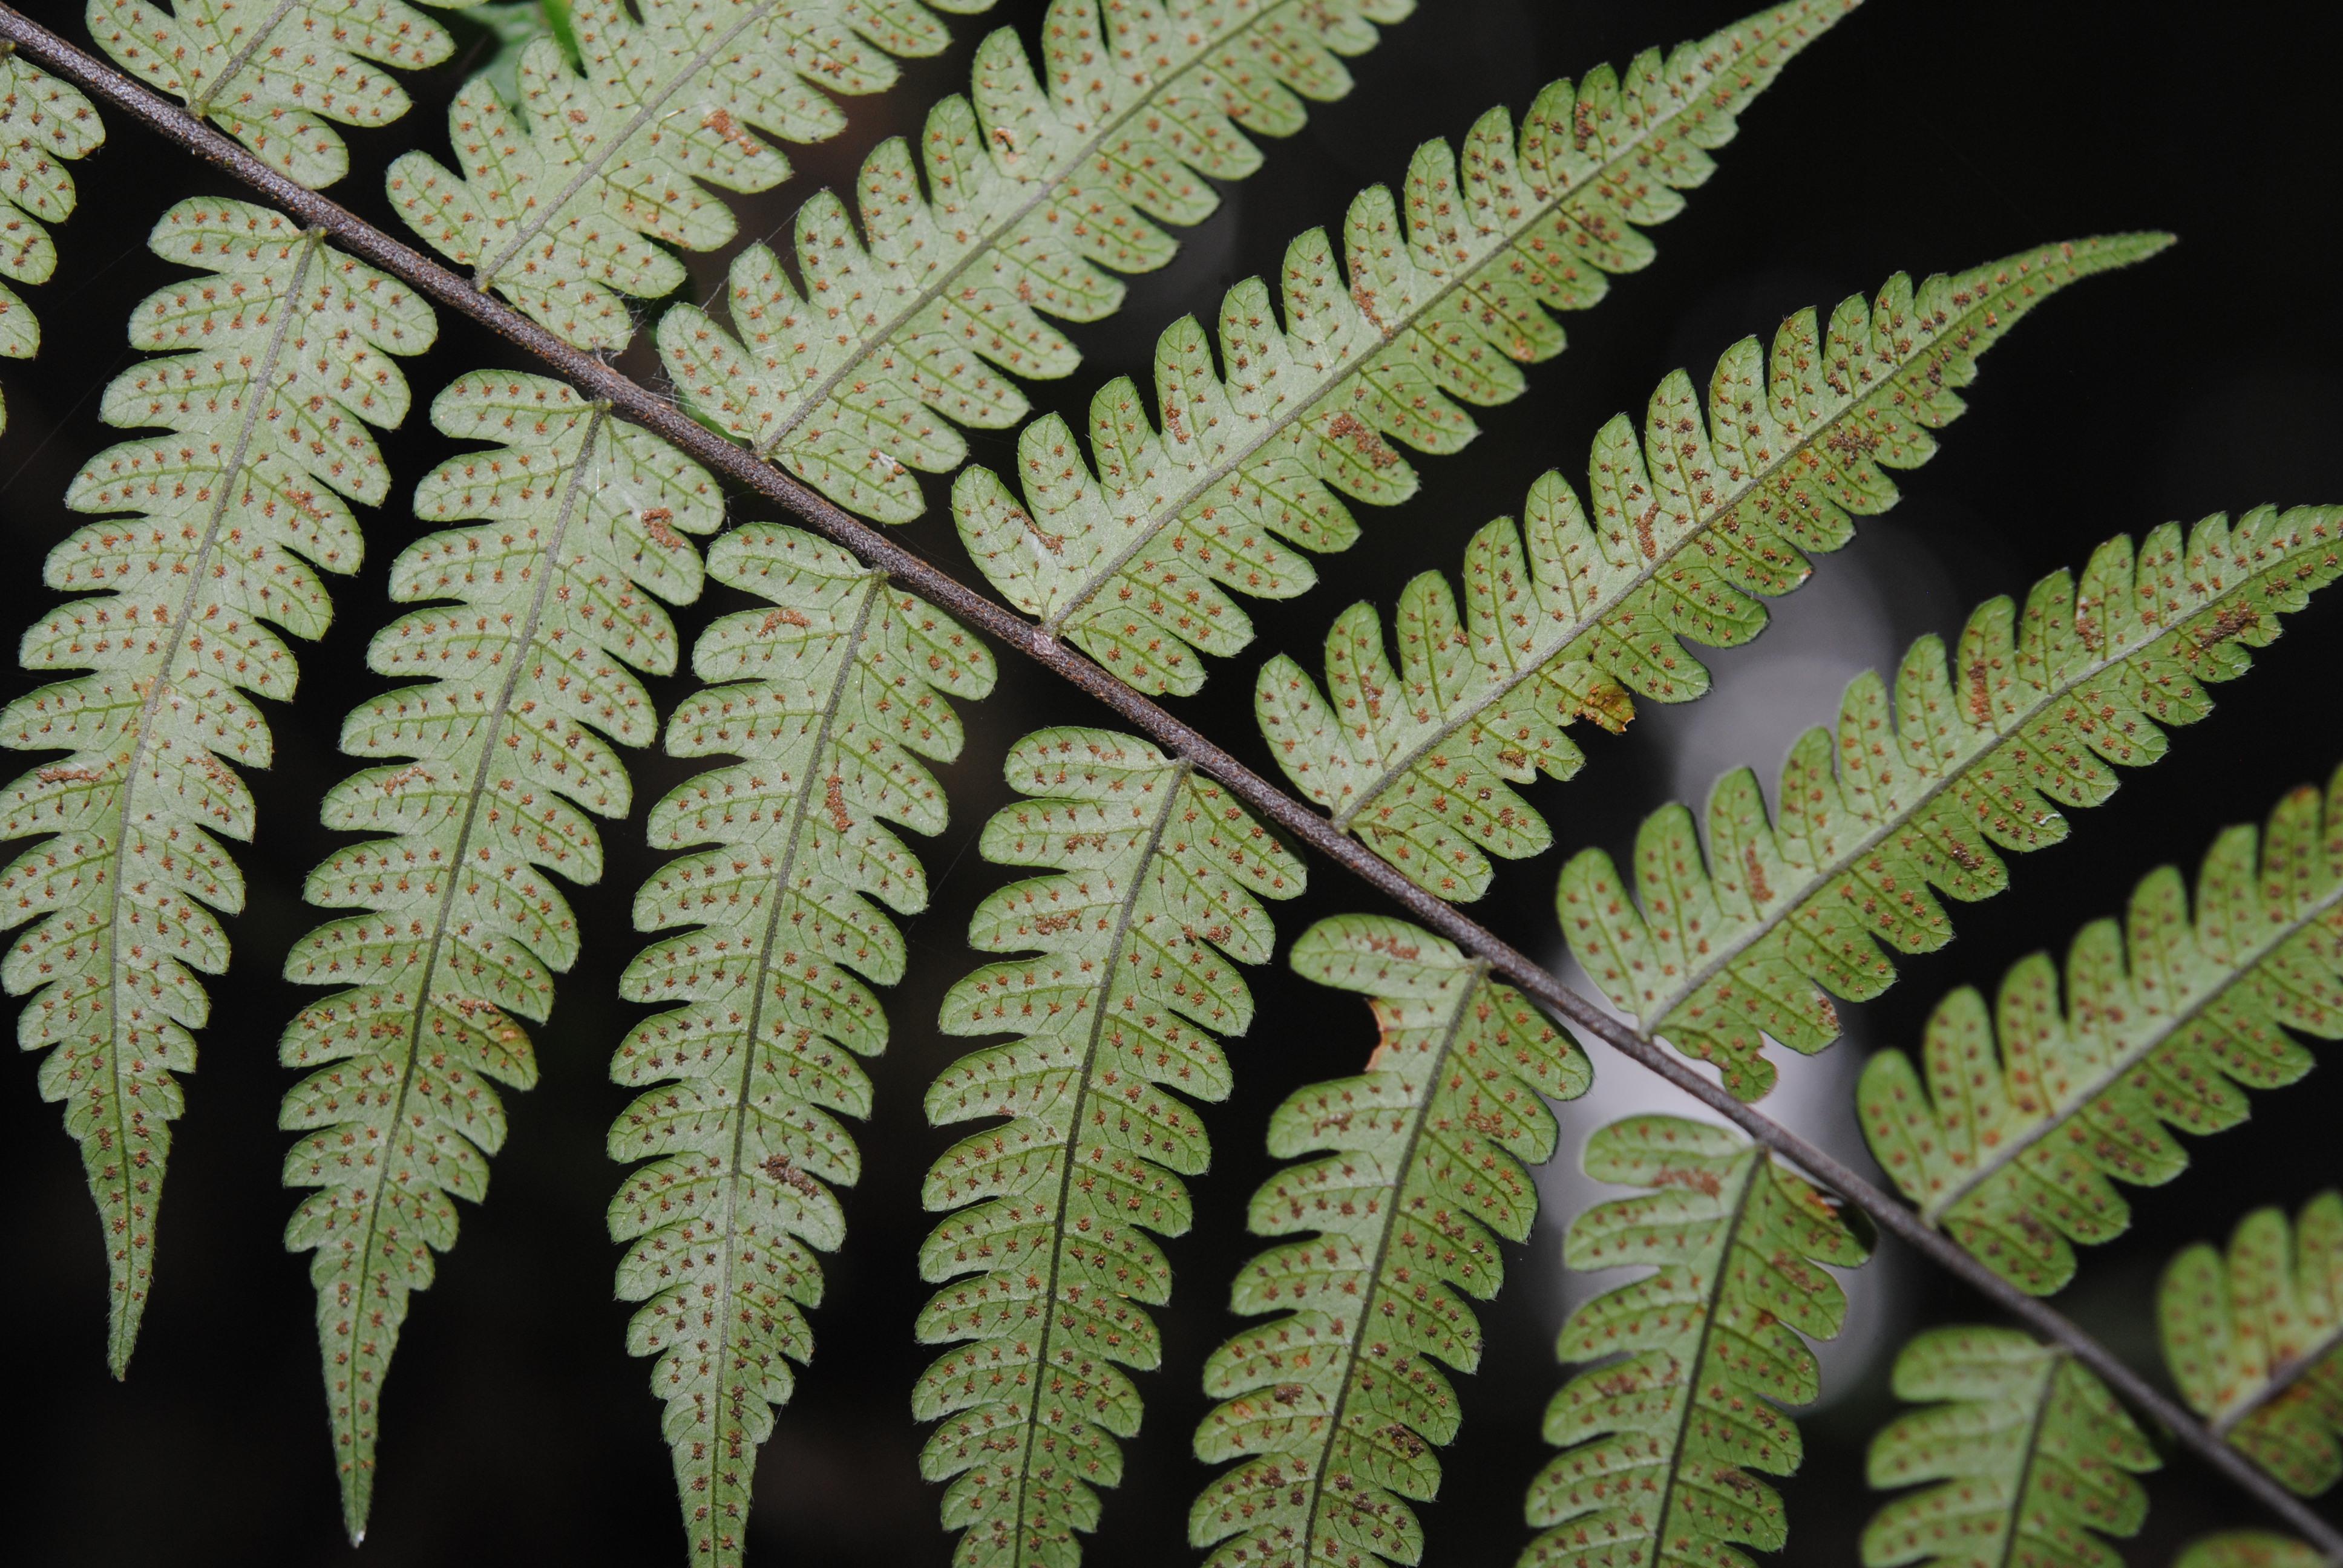 Sphaerostephanos aff. adenostegius